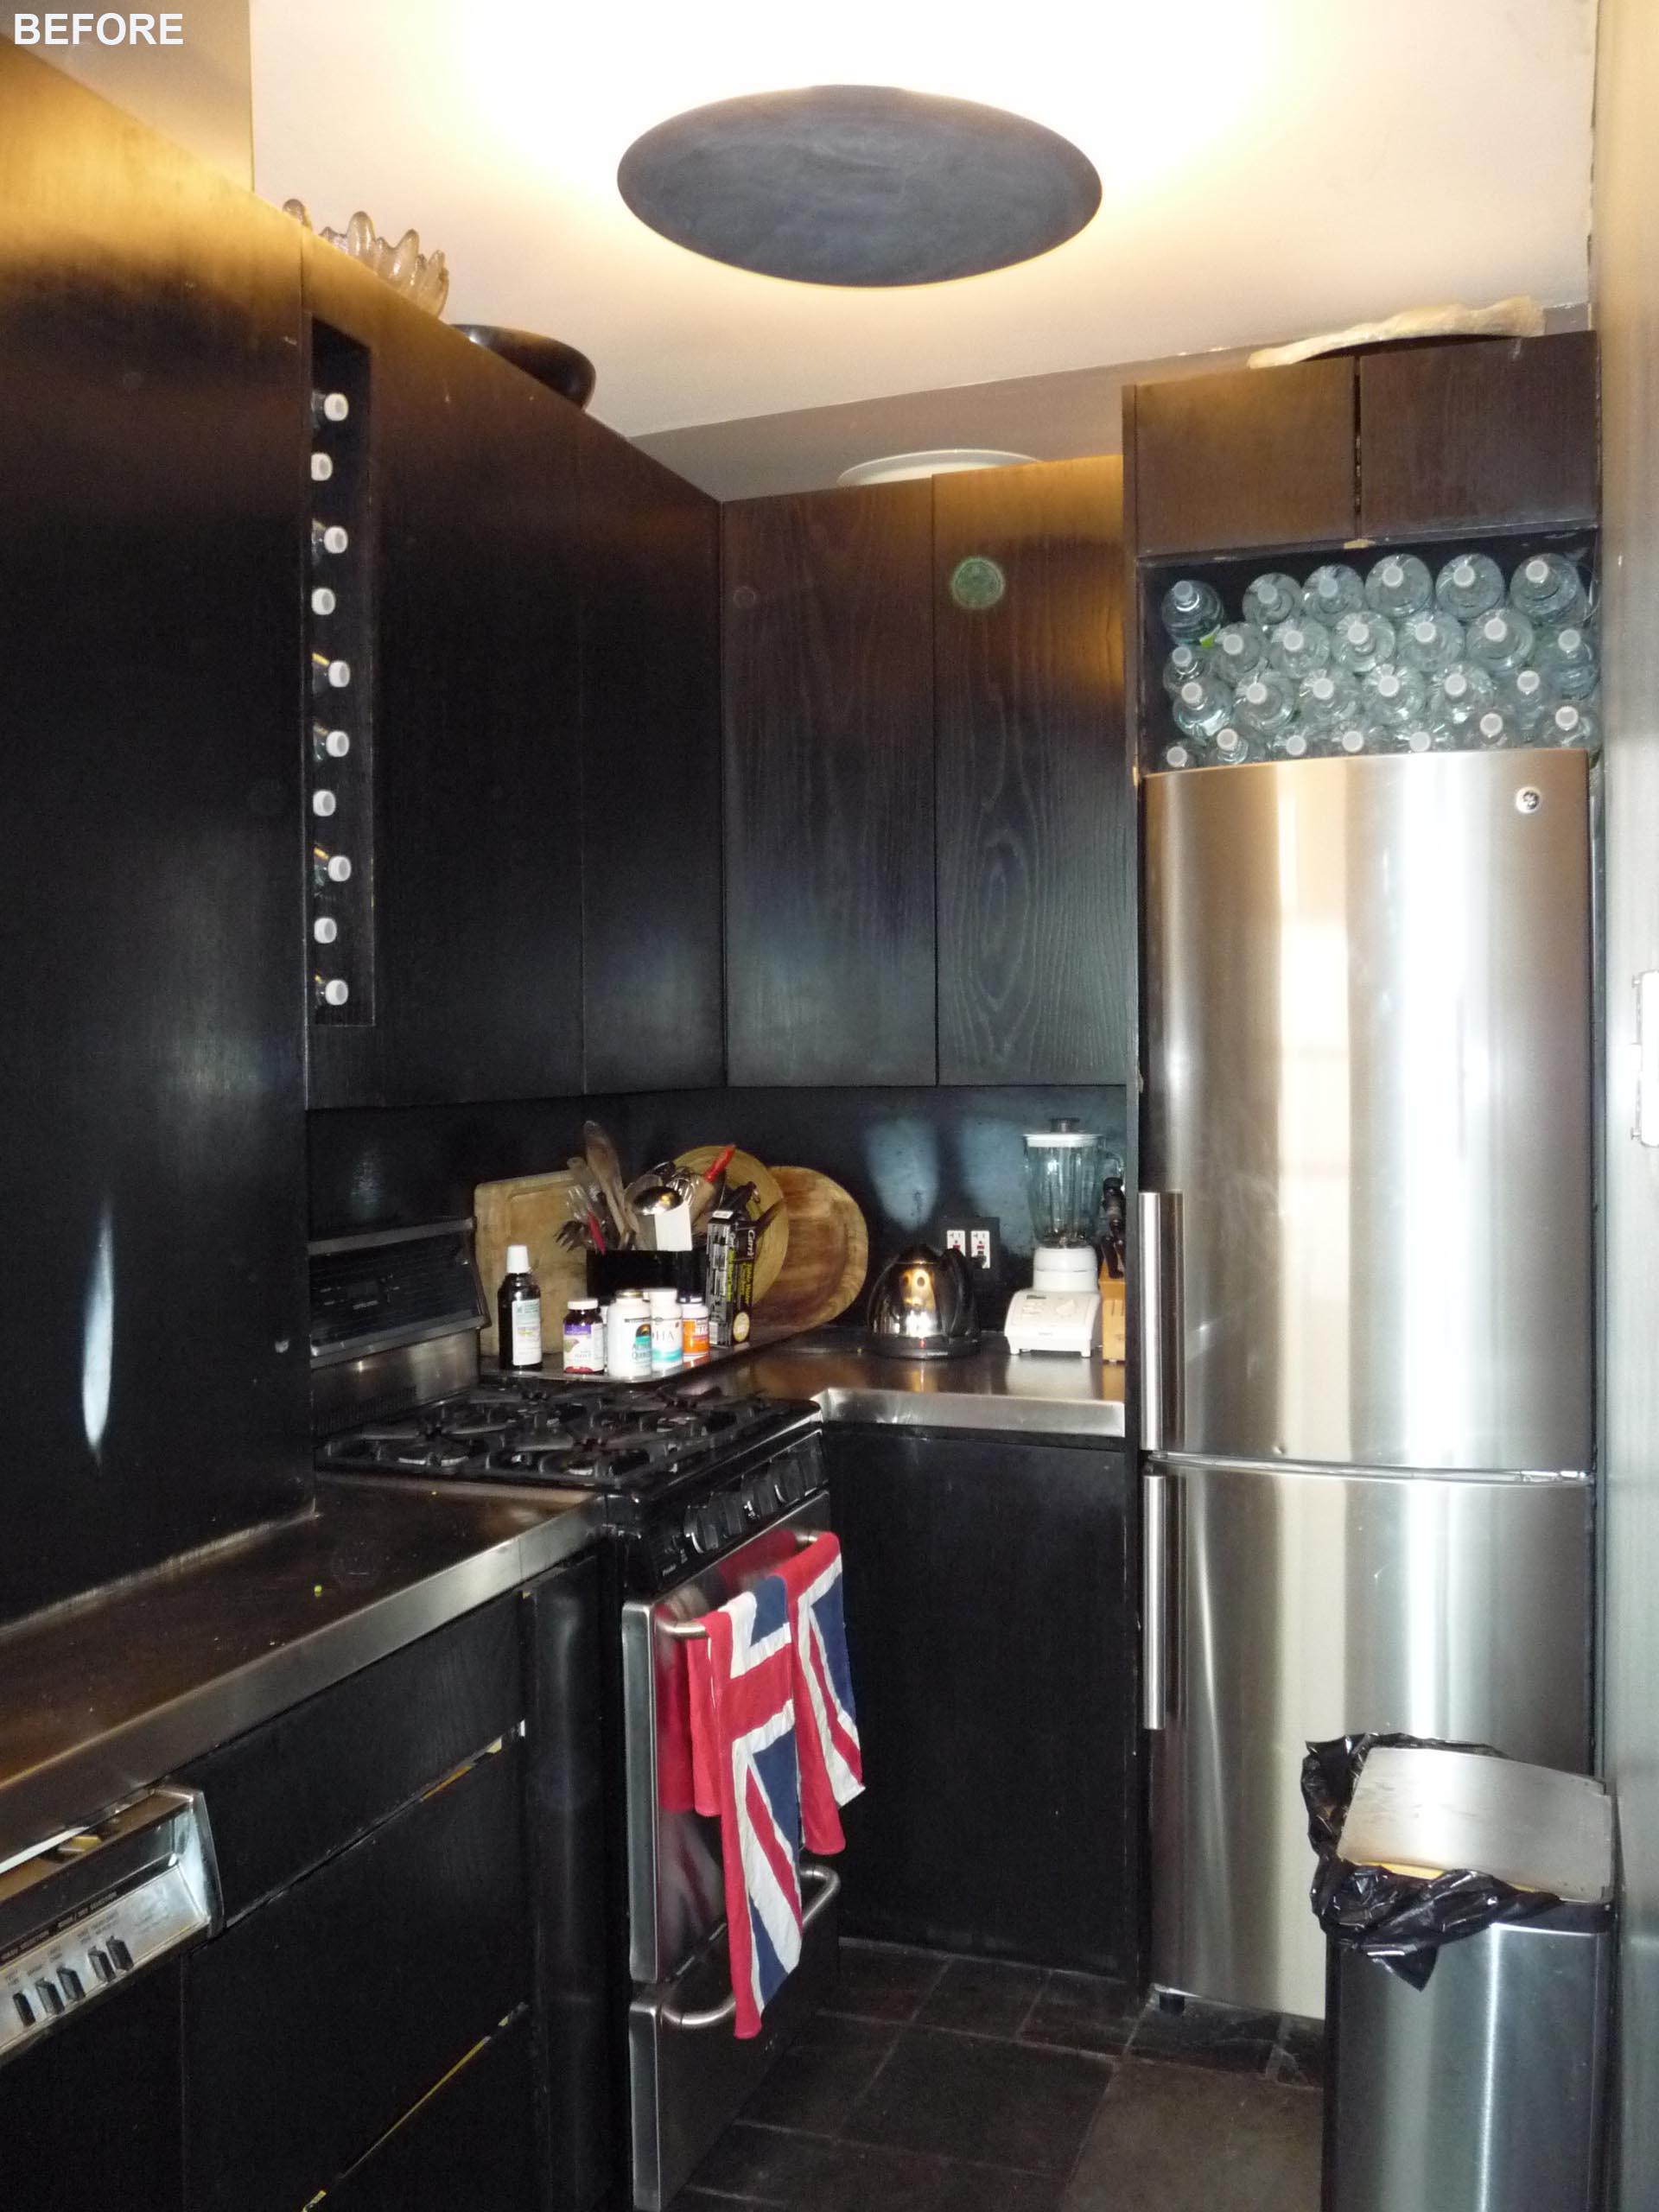 A black kitchen before a modern remodel.